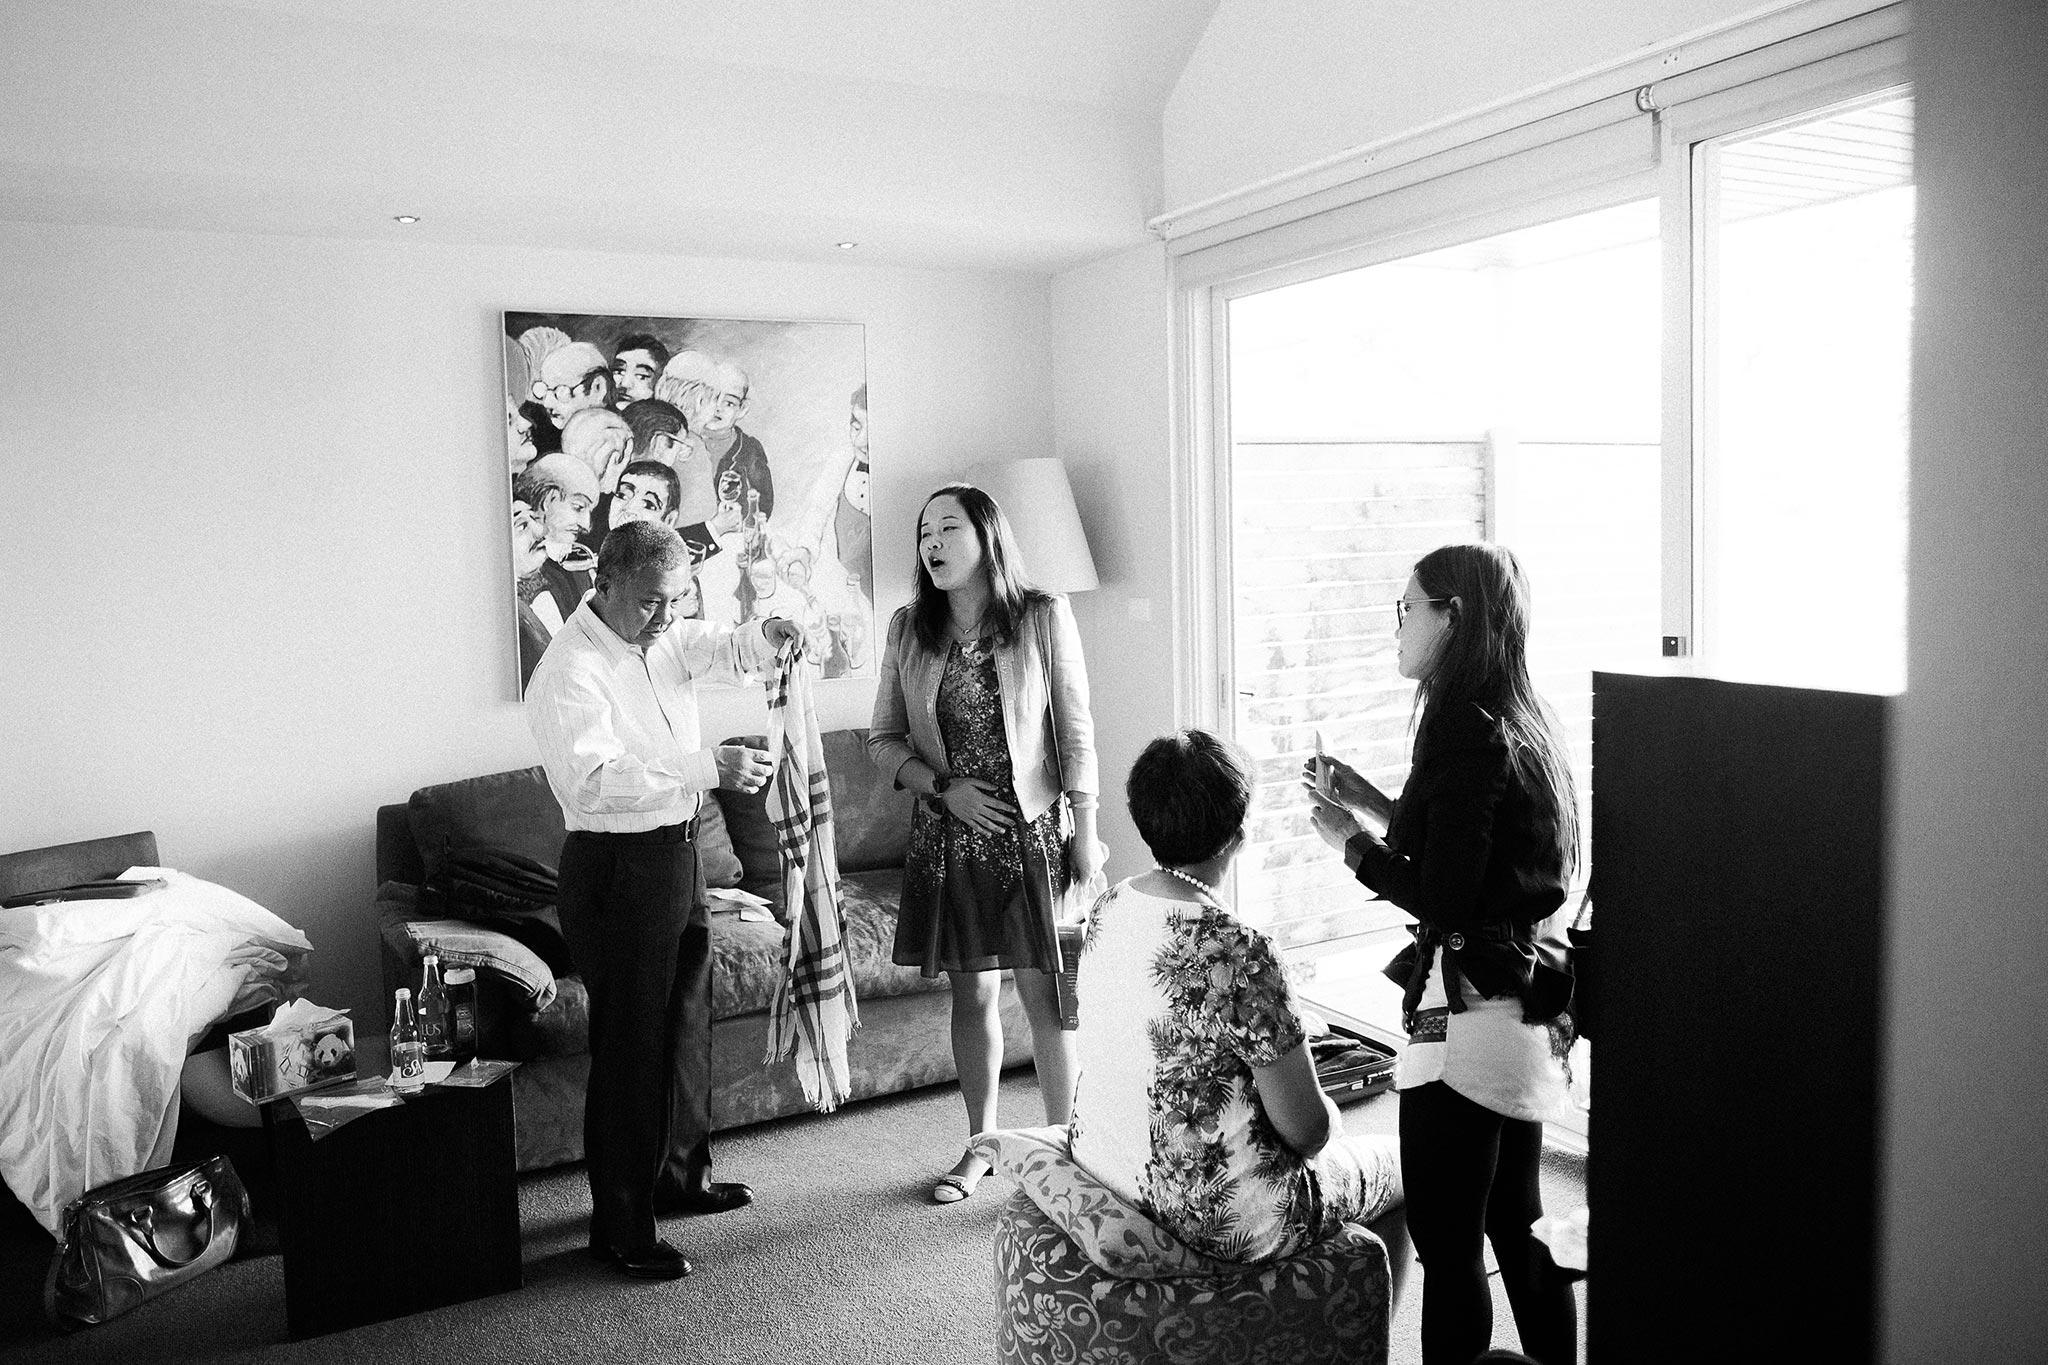 Daylesford-Lake-House-Wedding-Photography-bride-getting-ready